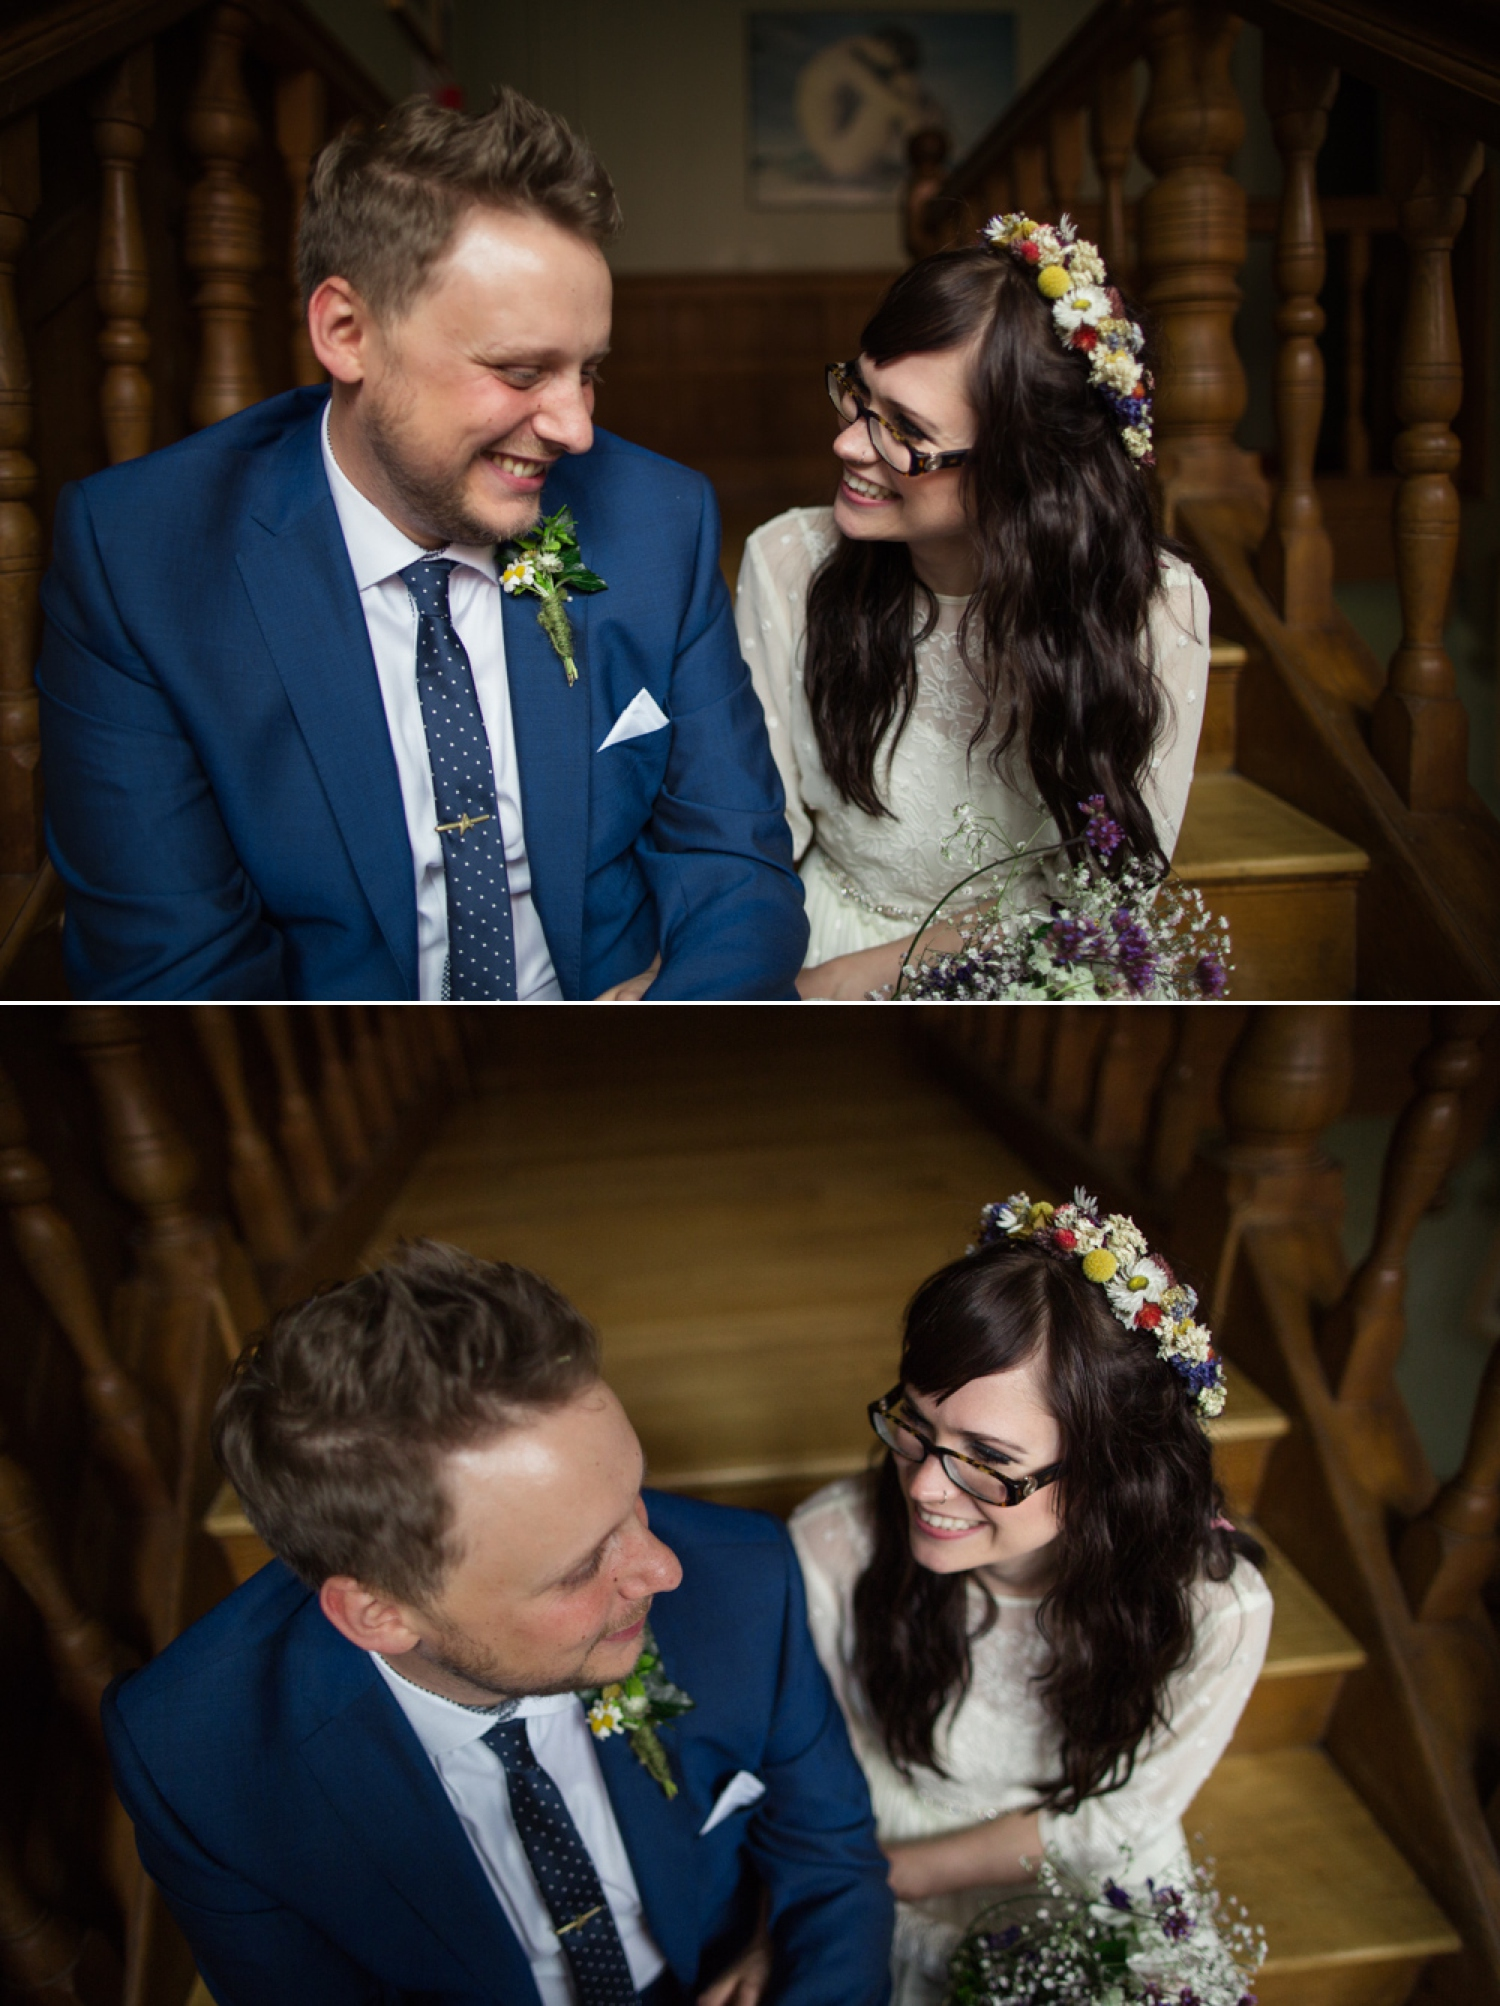 Cheshire Wedding Photographer Elly & Liam_0026